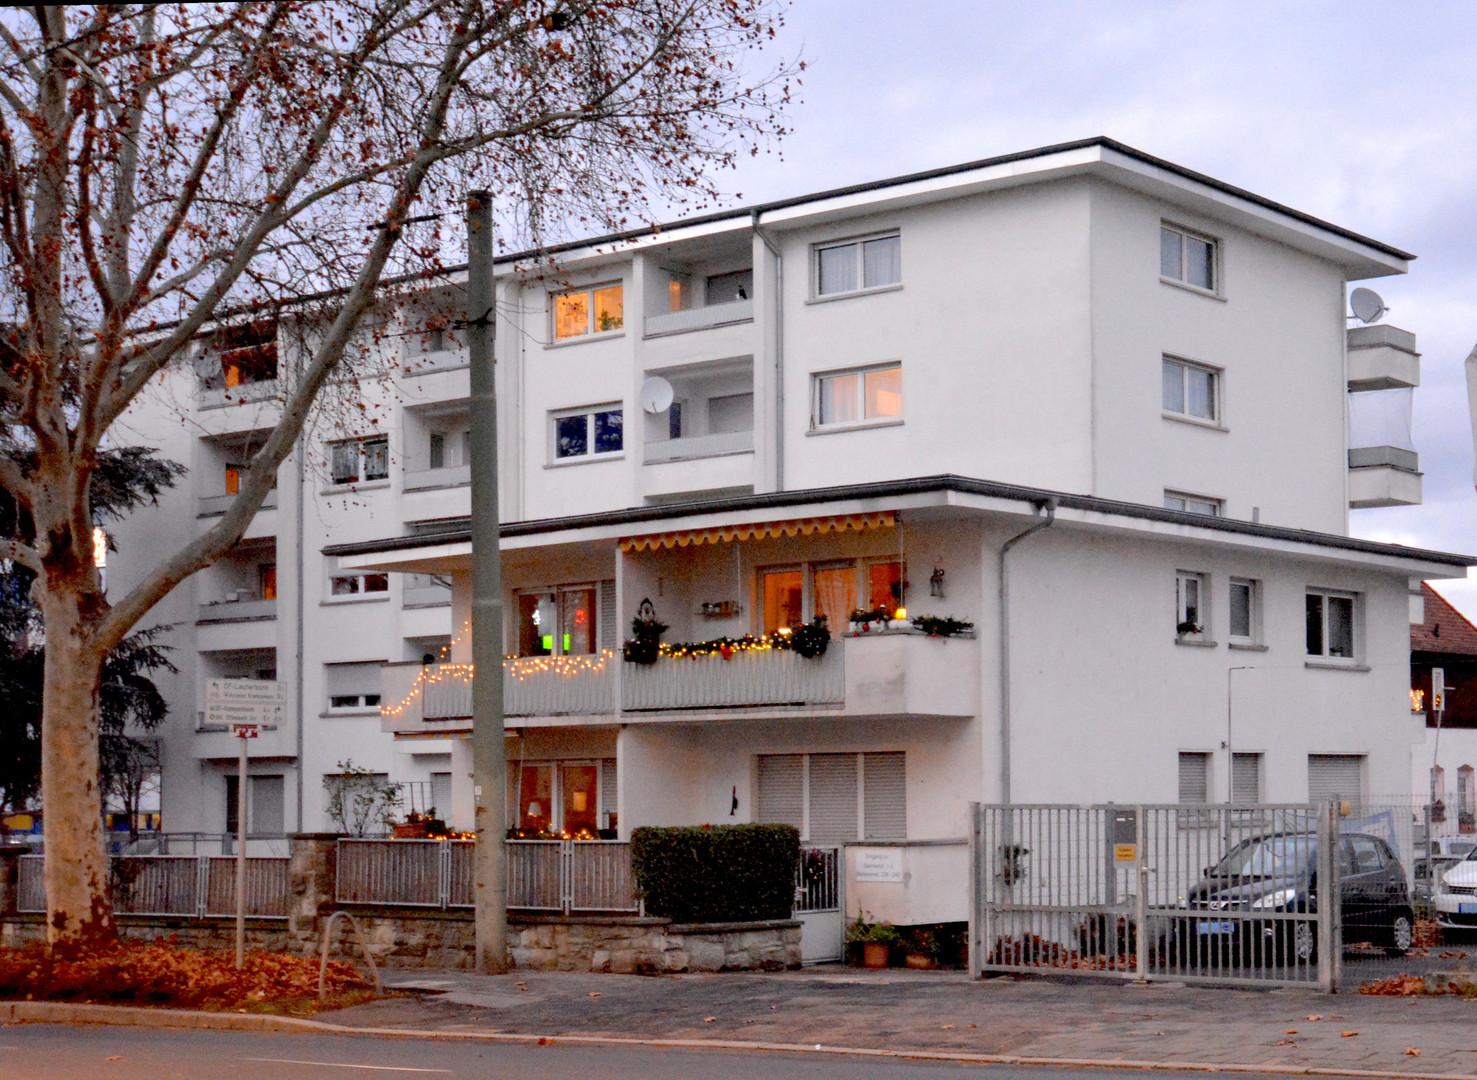 Offenbach11.jpg